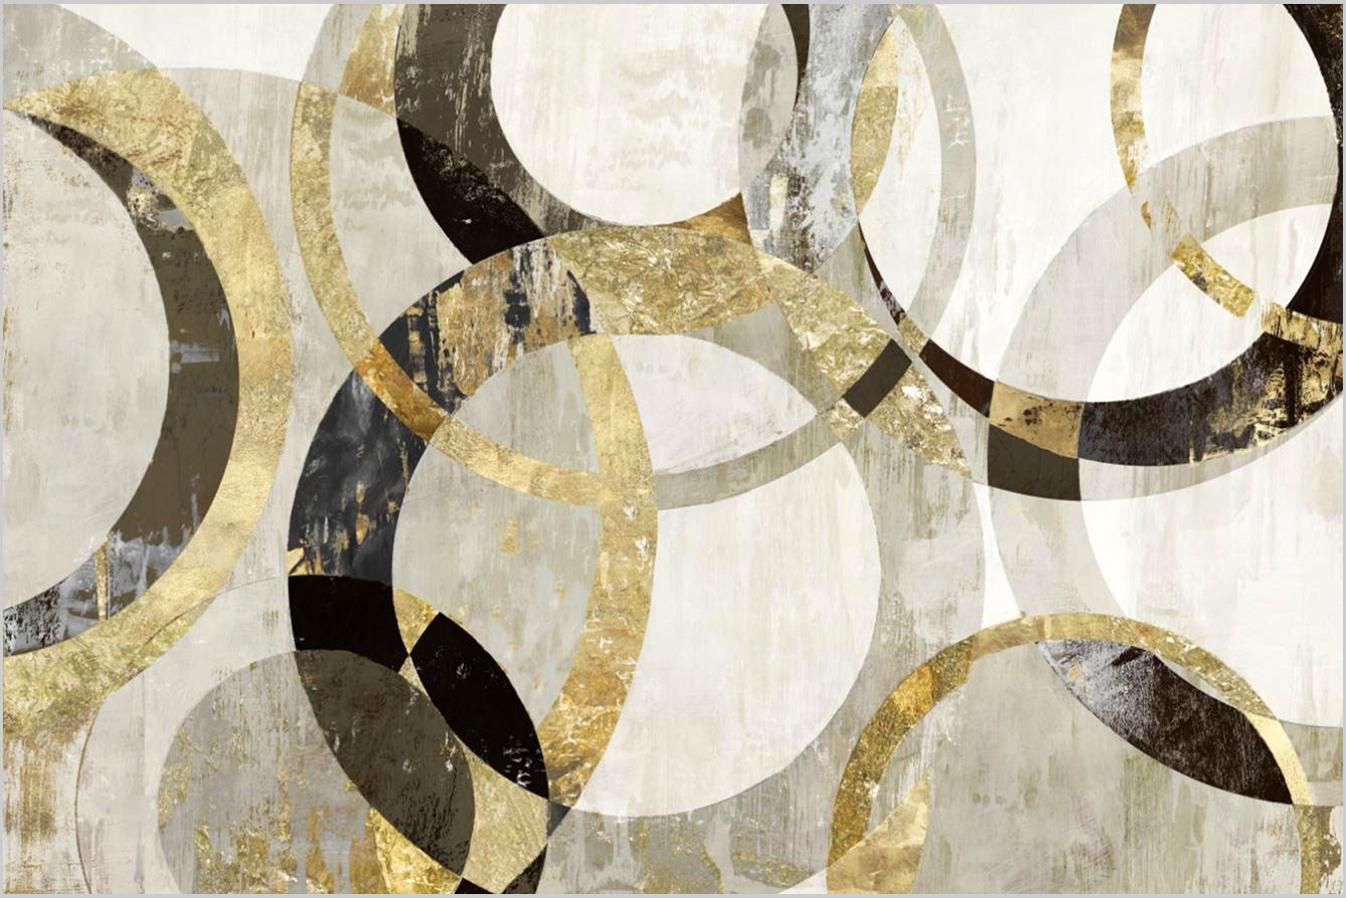 Cuadro canvas overlaps